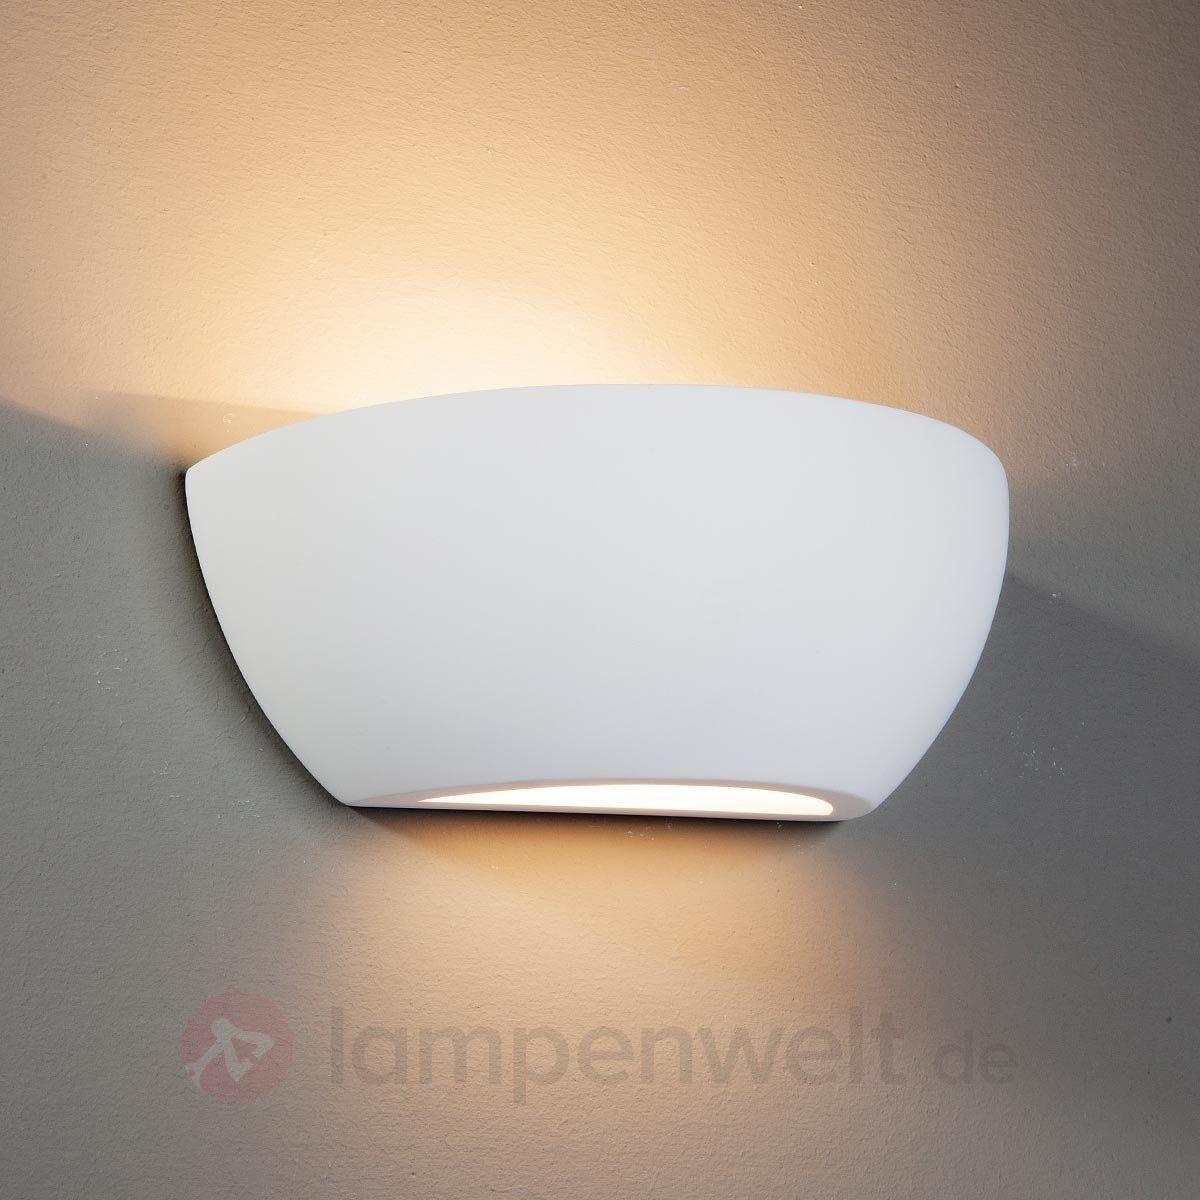 wandleuchte felia aus gips wei lampen wandleuchte w nde und gips. Black Bedroom Furniture Sets. Home Design Ideas